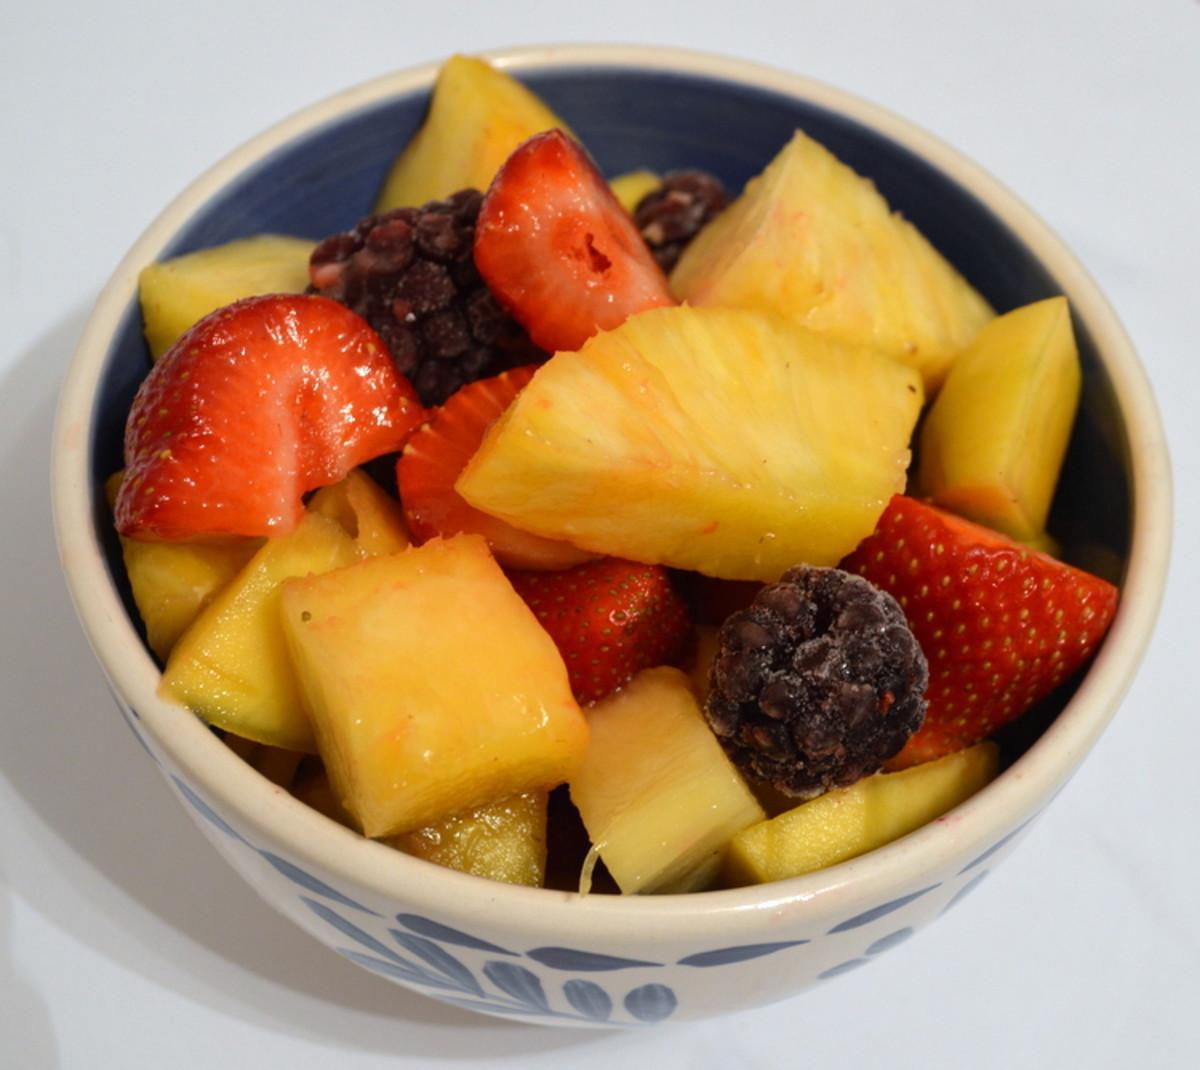 Mango, pineapple, strawberries, and blackberries in a tasty fruit salad.